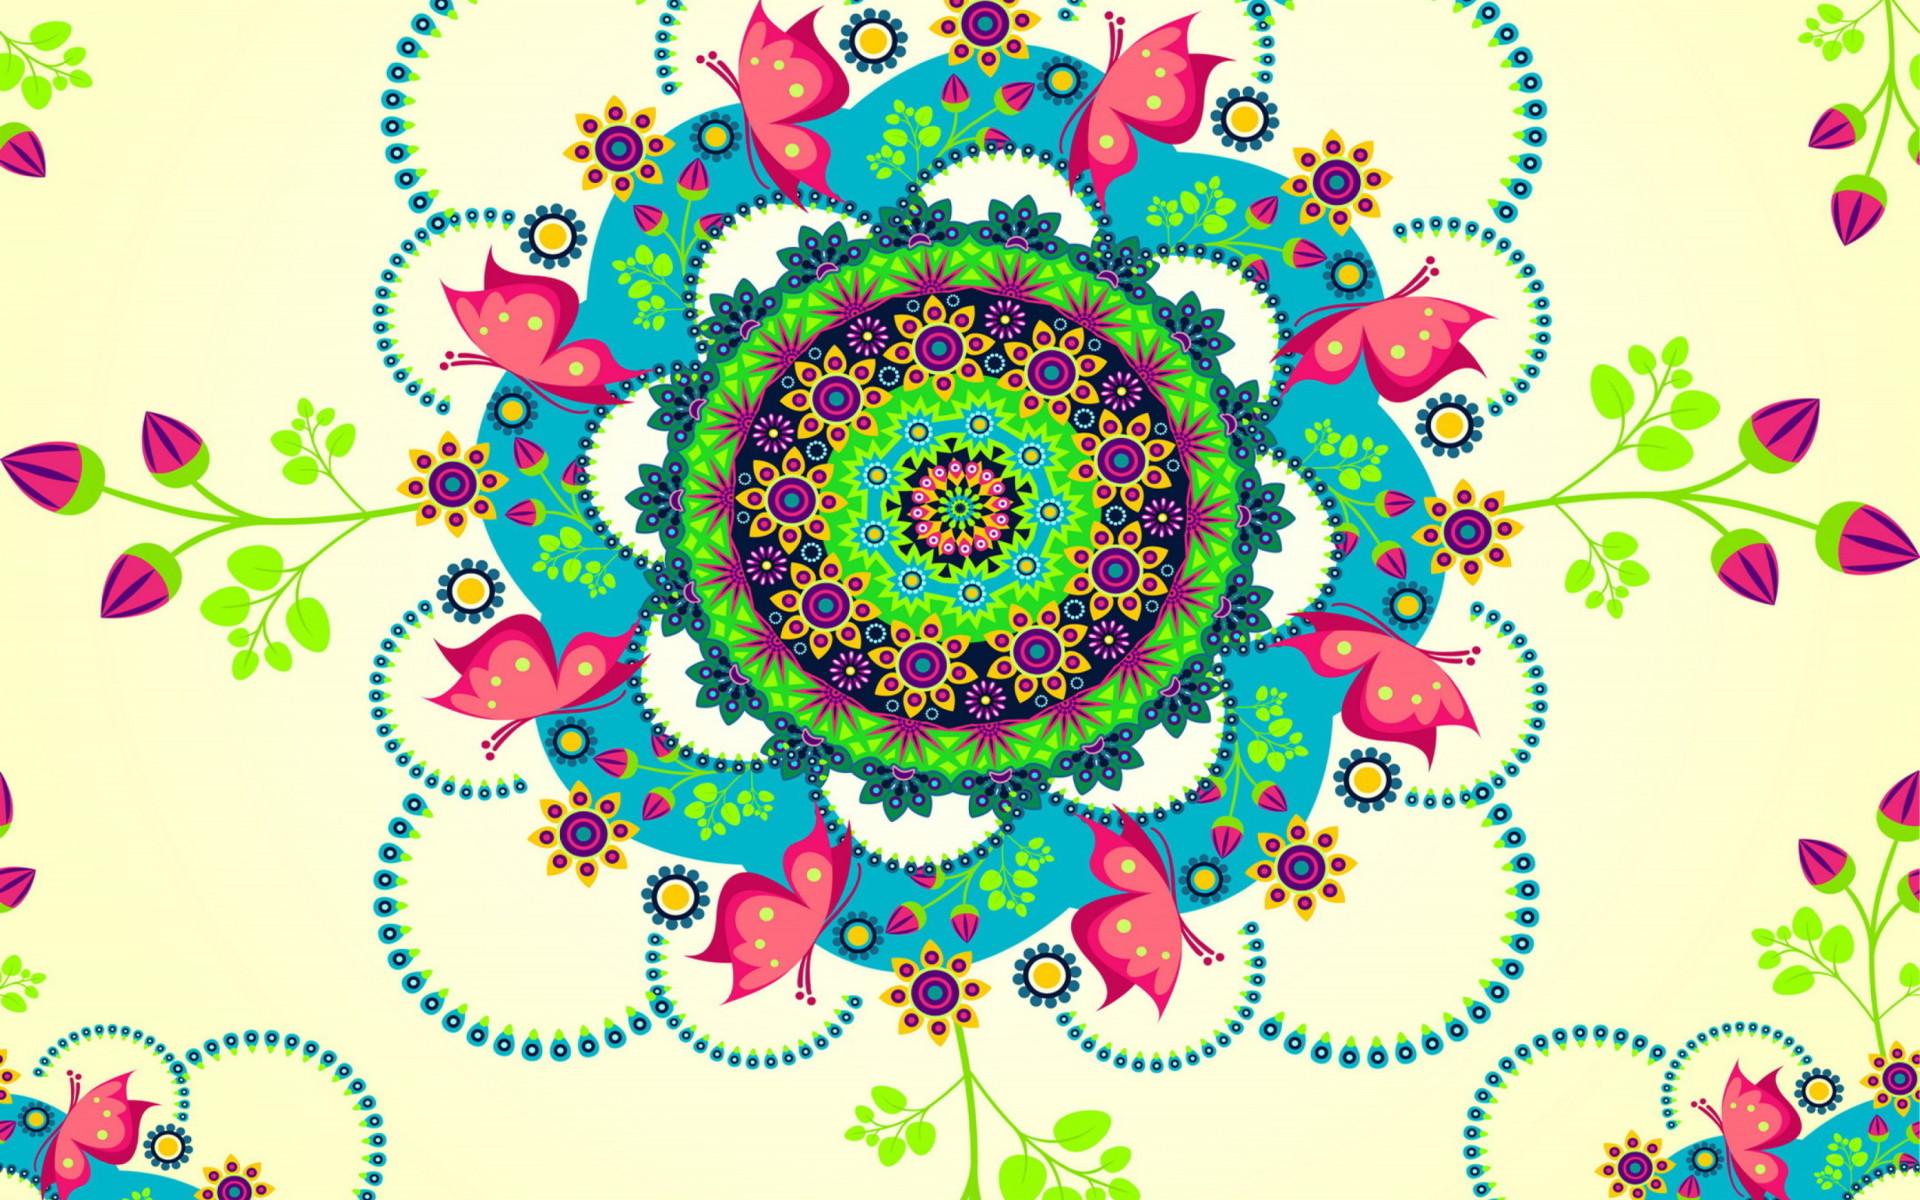 Mandala Flowers Wallpaper for Widescreen Desktop PC 1920×1080 Full HD